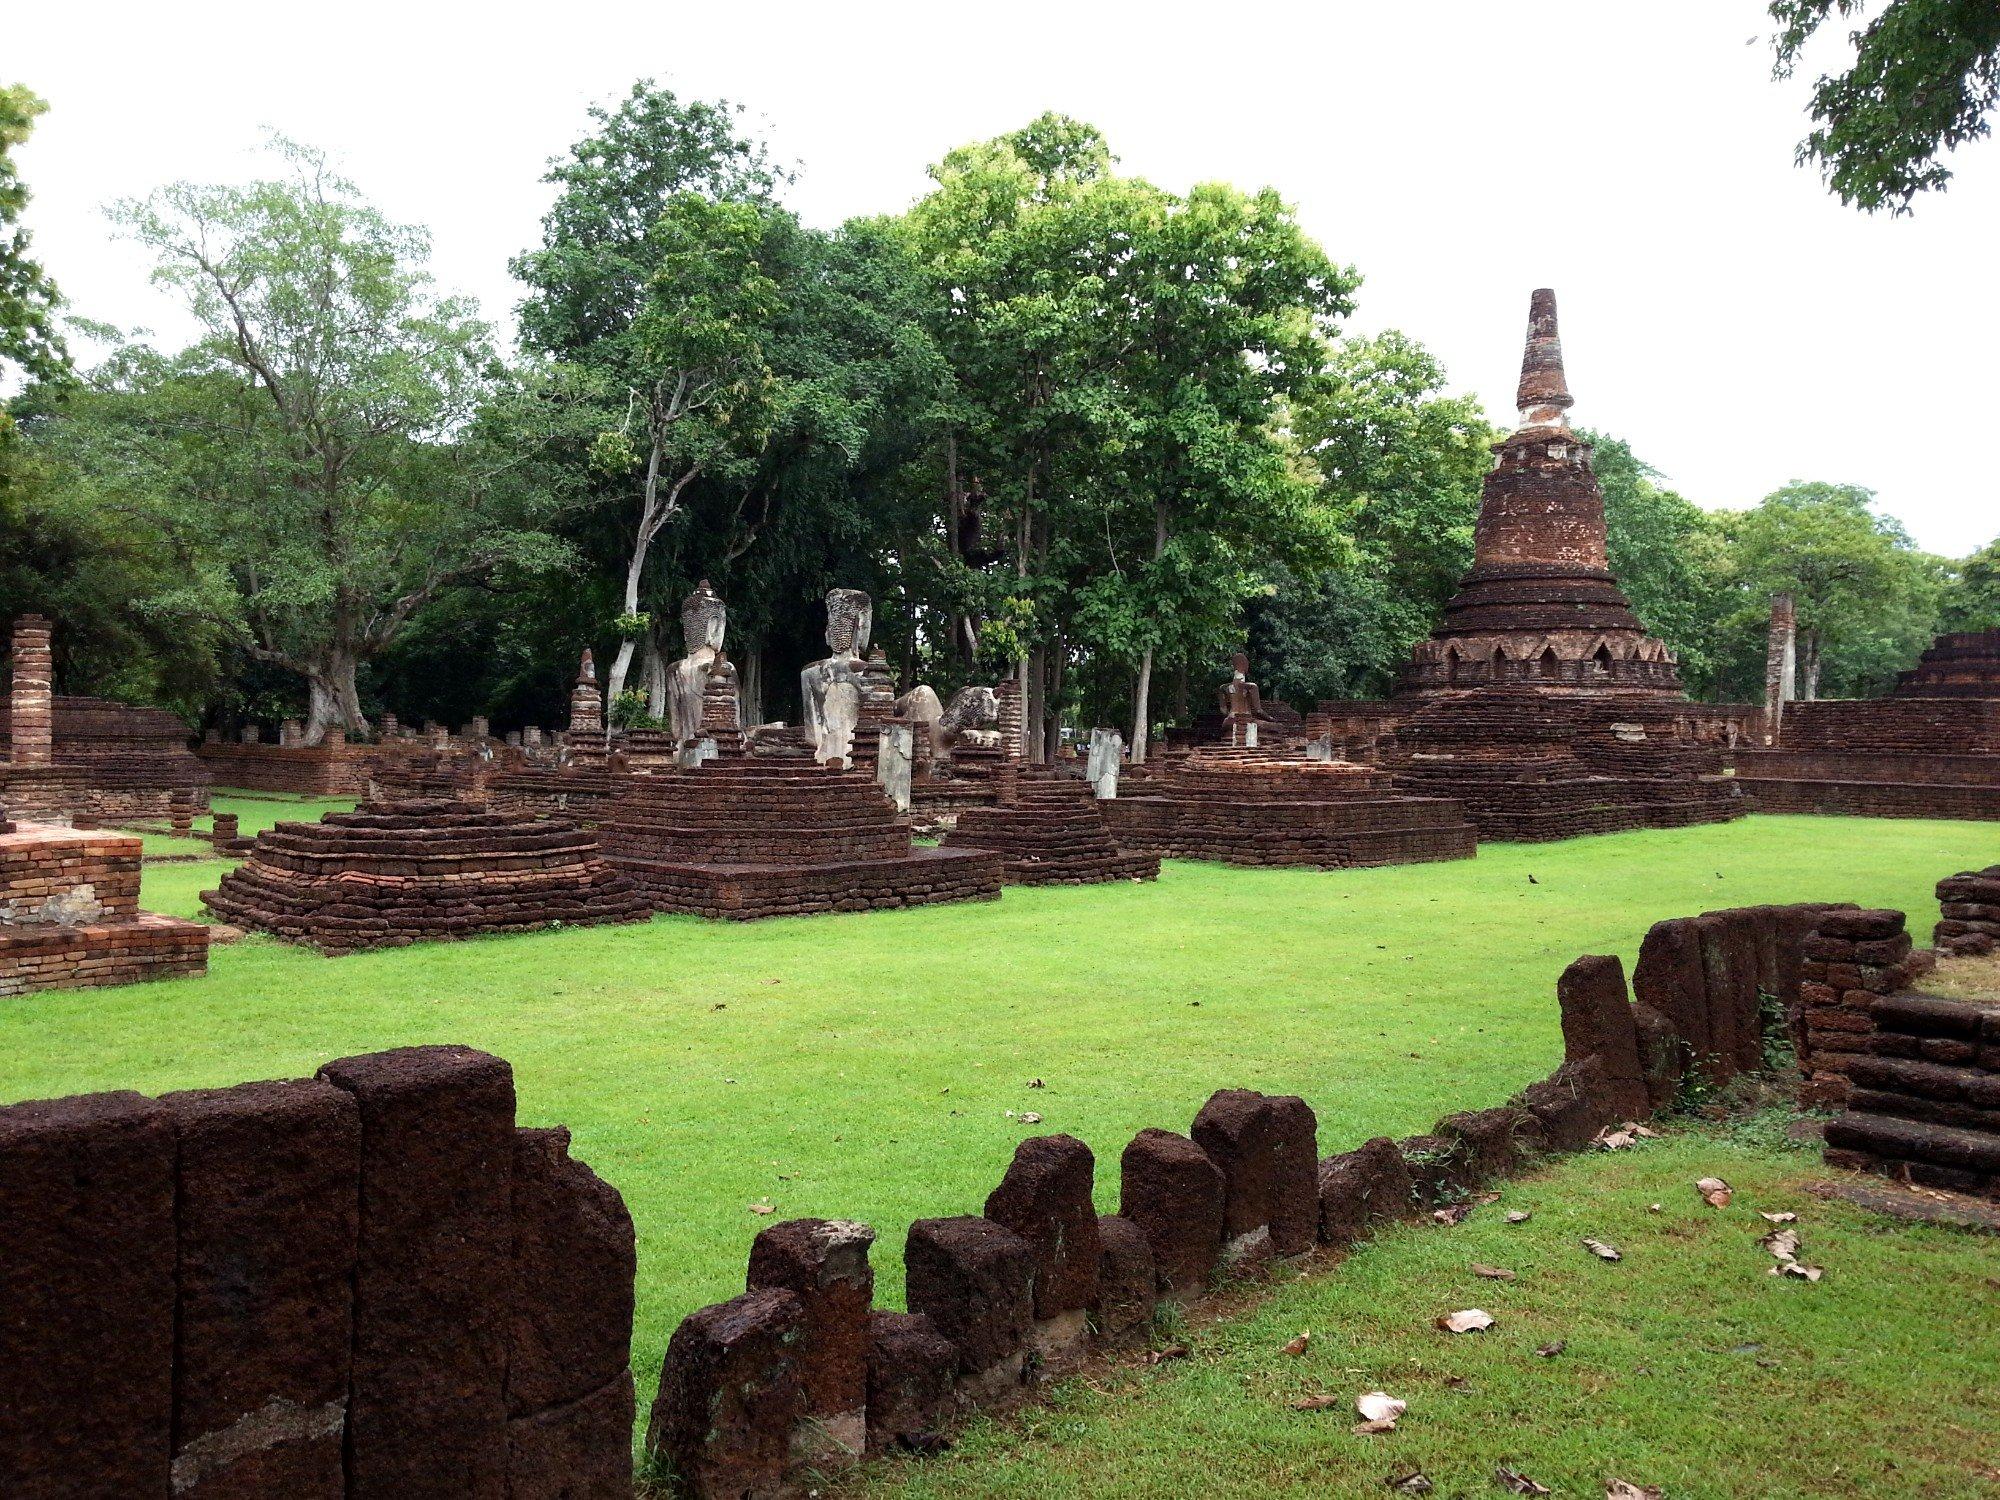 Wat Phra Kaew at Kamphaeng Phet Historical Park